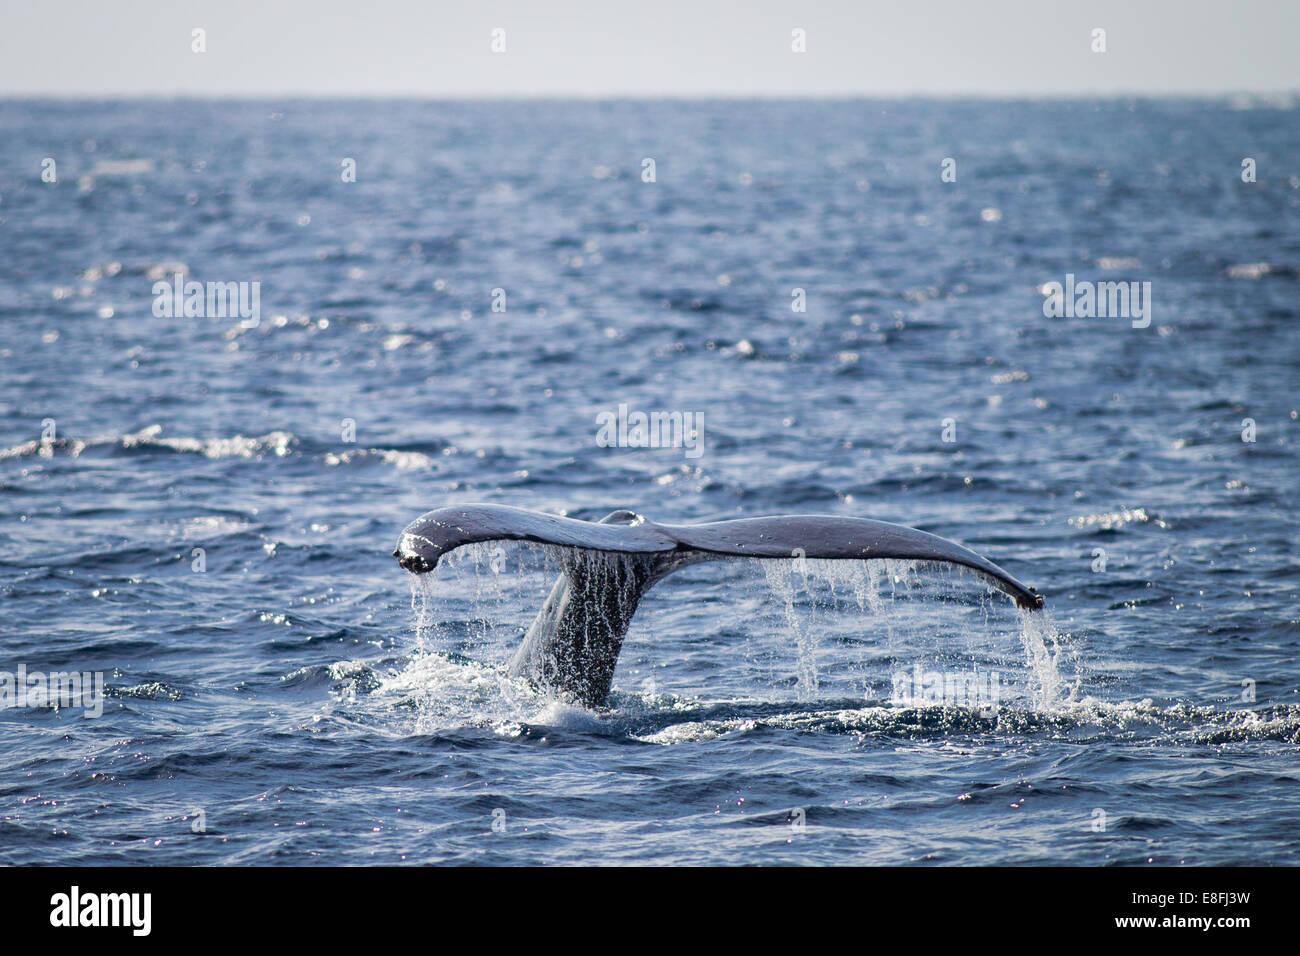 Whale Tail plantschen, Okinawa, Japan Stockbild